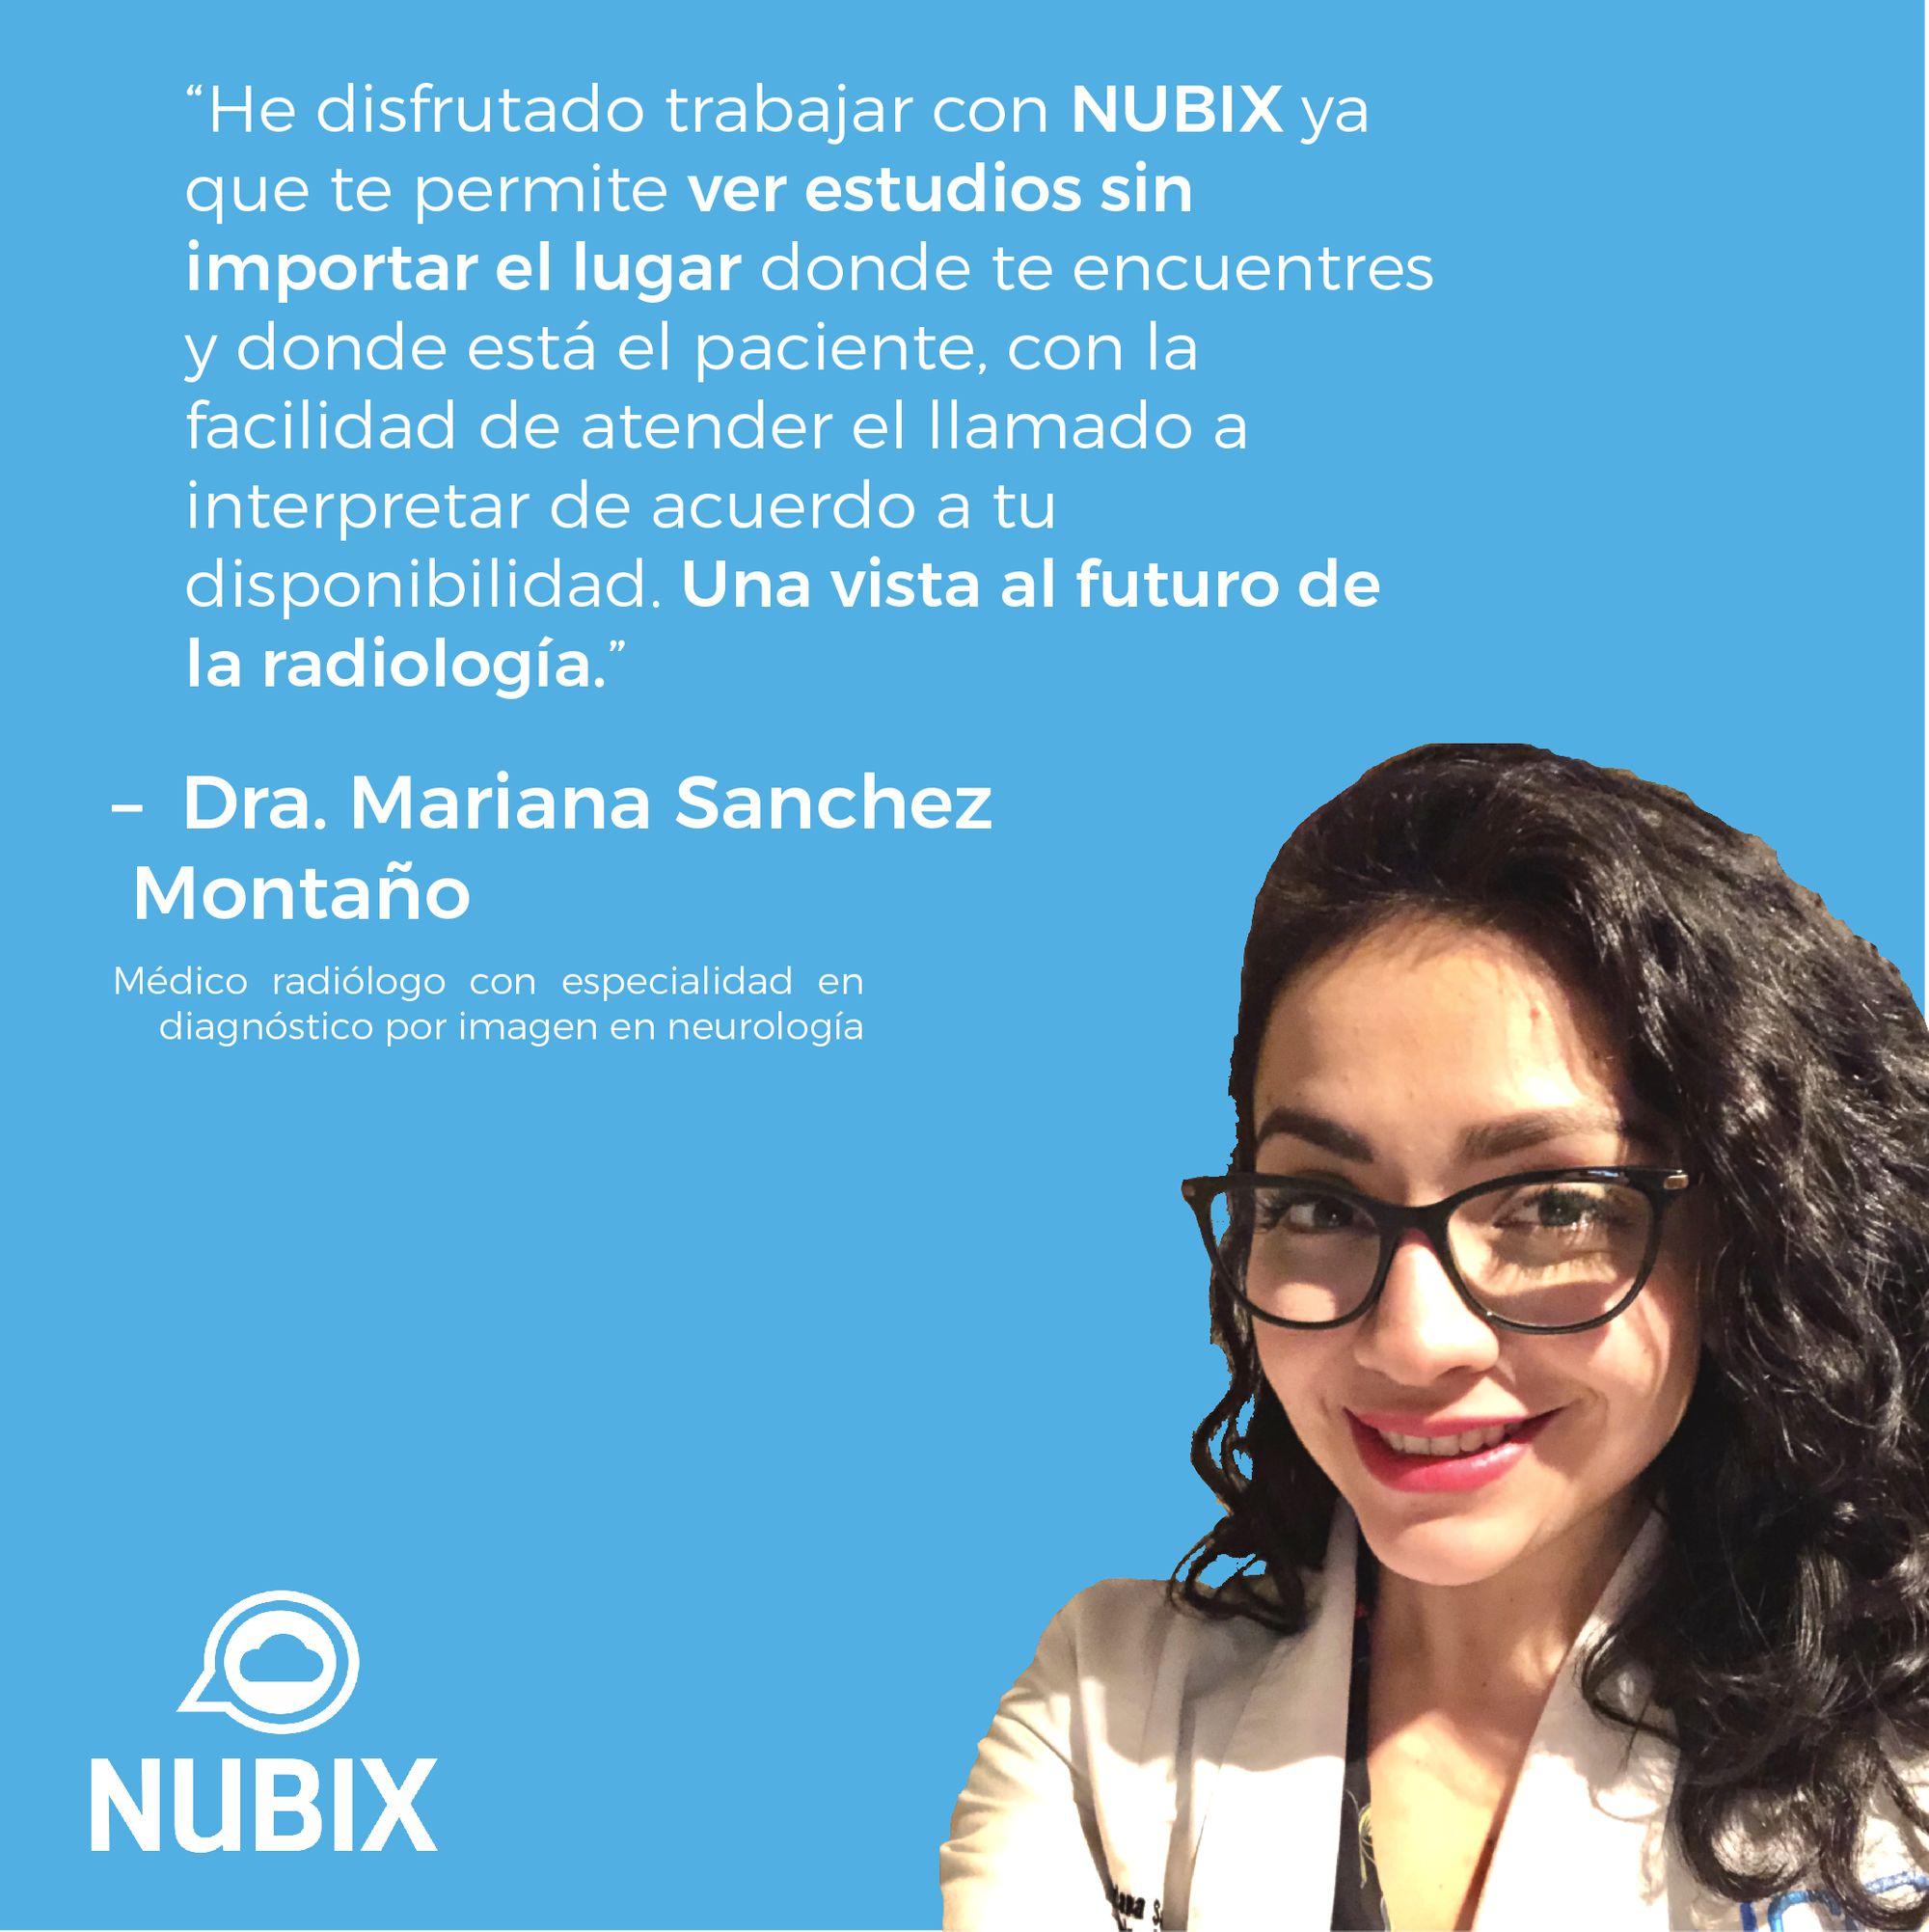 Testimonios NUBIX: Dra. Mariana Sanchez Montaño